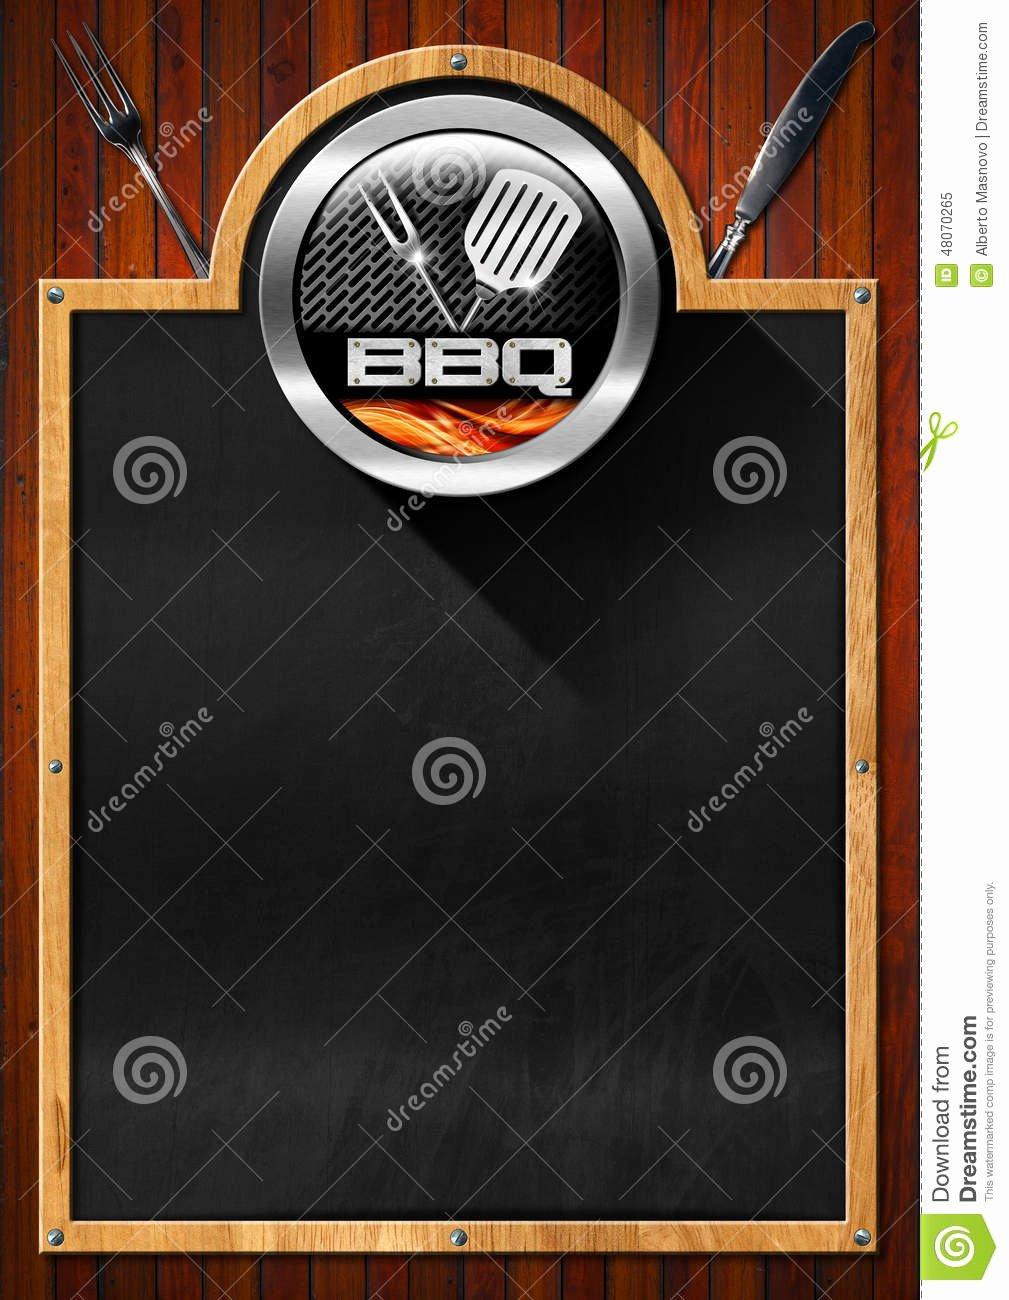 Bbq Catering Menu Template Inspirational Blackboard for Barbecue Menu Stock Illustration